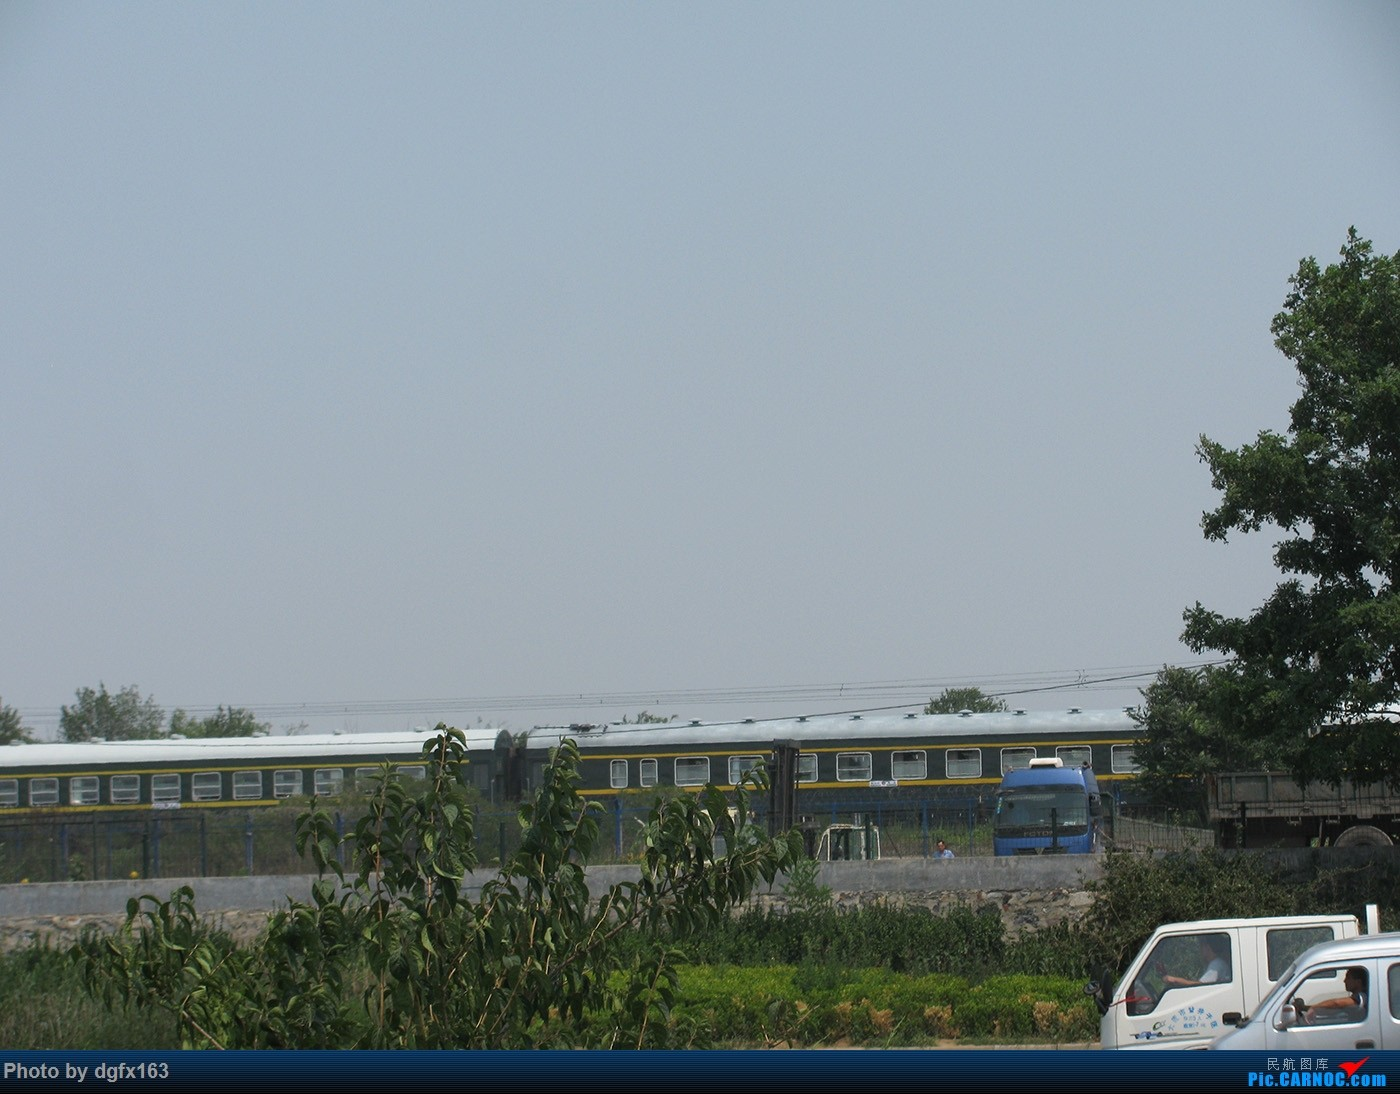 Re:[原创]【dgfx163的拍机(1)大连周水子DLC,烈日拍机1小时半。全日空、日本航空、大韩。。。还不错 BOEING 737-800 B-5743 中国大连周水子国际机场 中国大连周水子国际机场